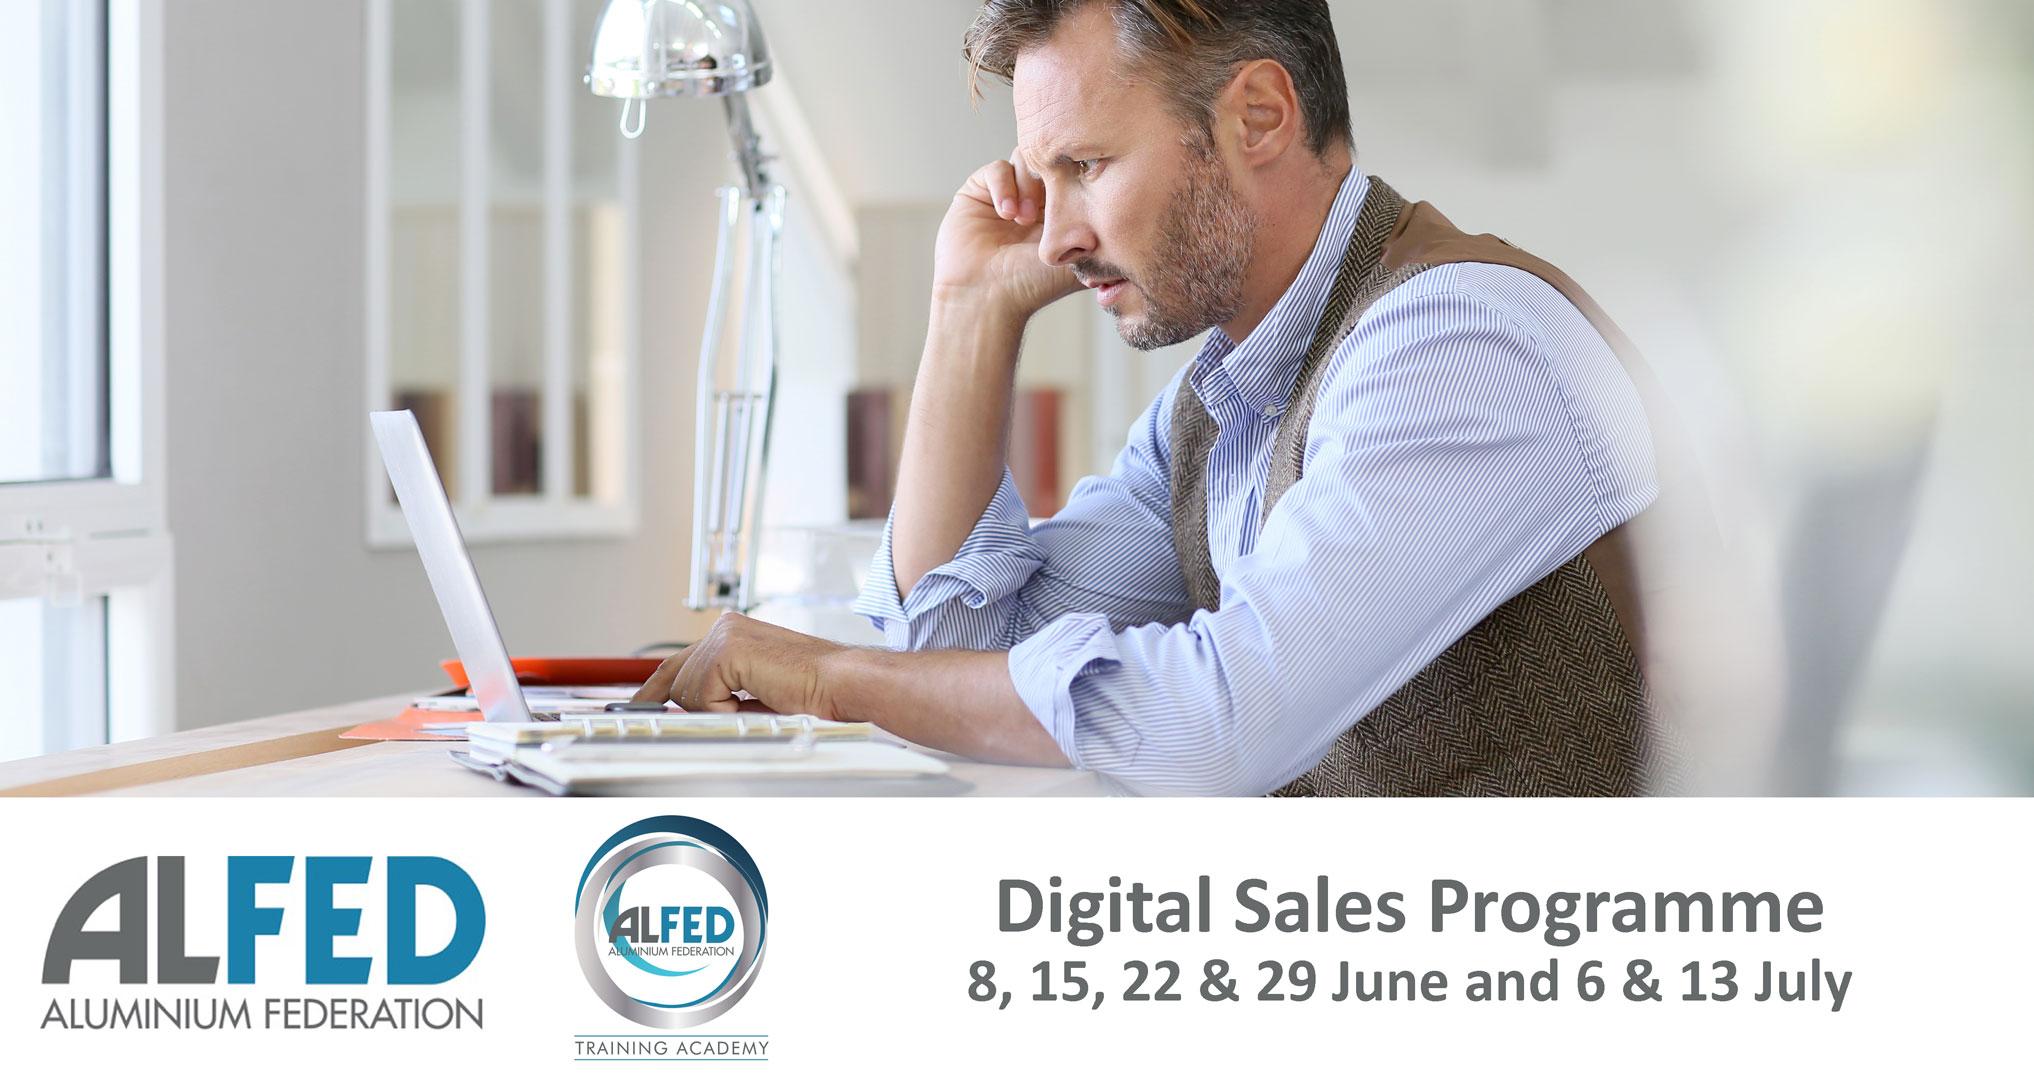 ALFED Digital Sales Programme